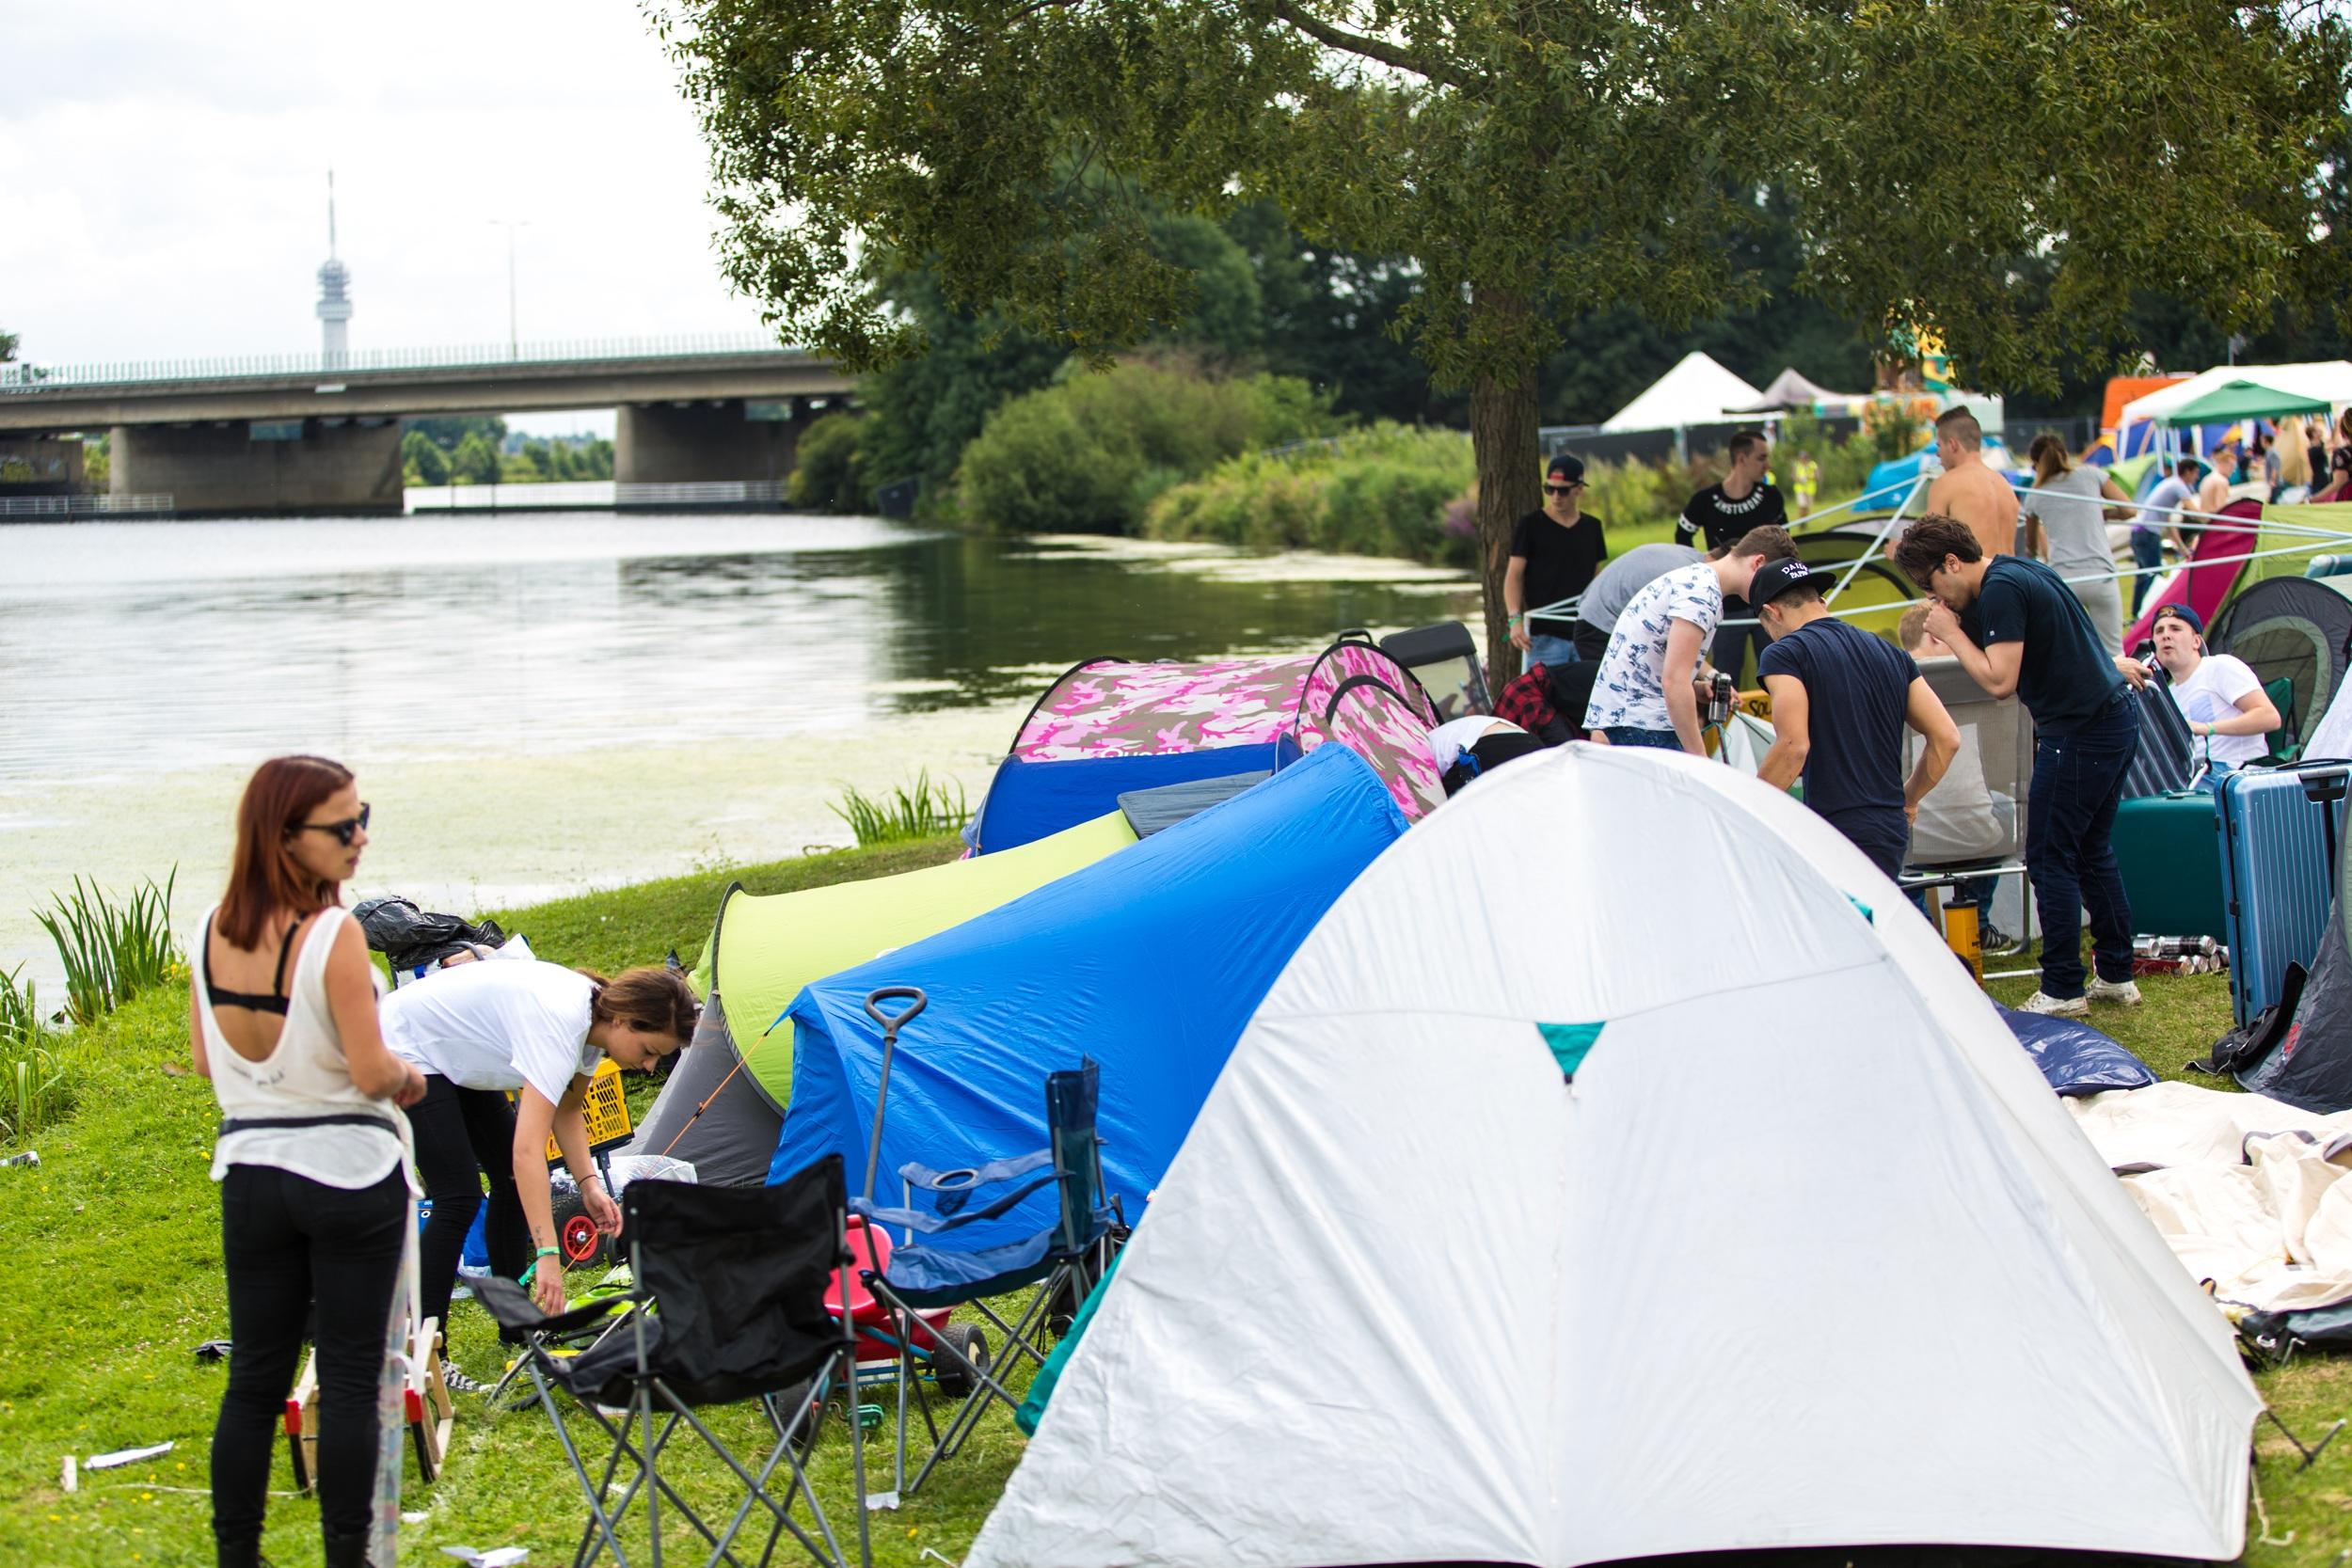 Camping @ Solar Weekend Festival - Fotocredits Stephan Colen - Persbericht MyNewsDesk)